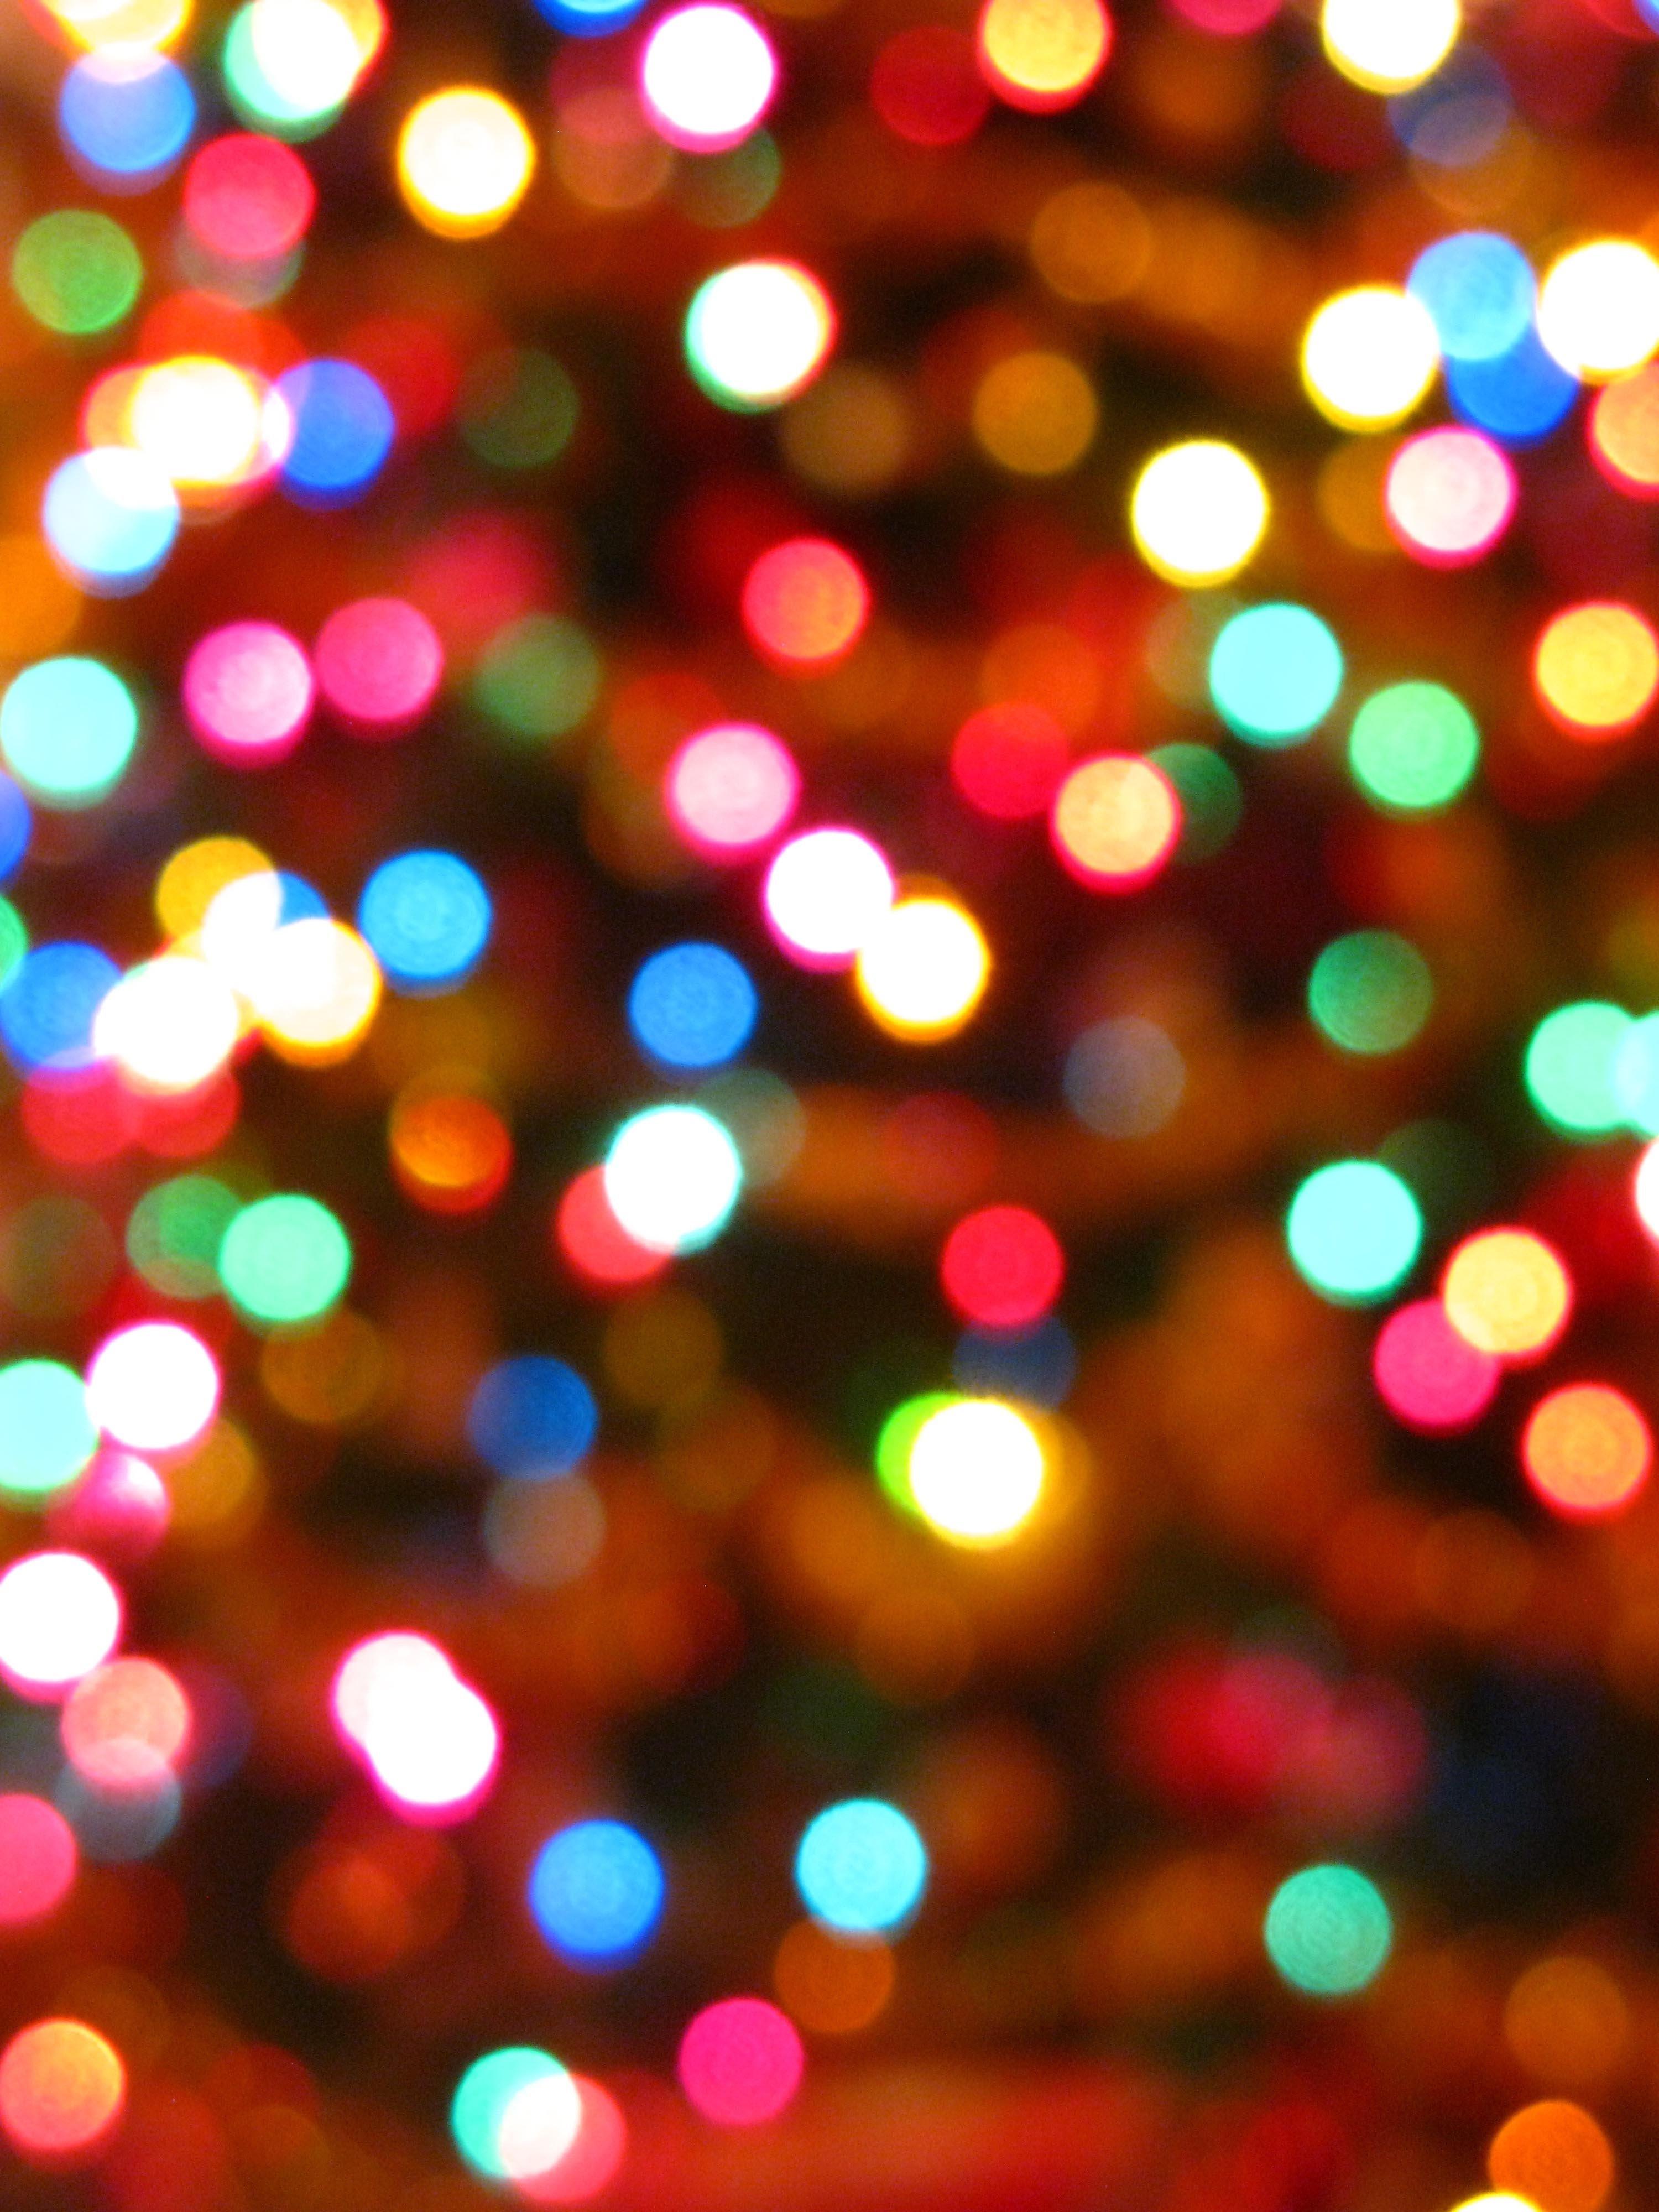 holiday lights christmas beauty wallpaper | 3000x4000 | 813142